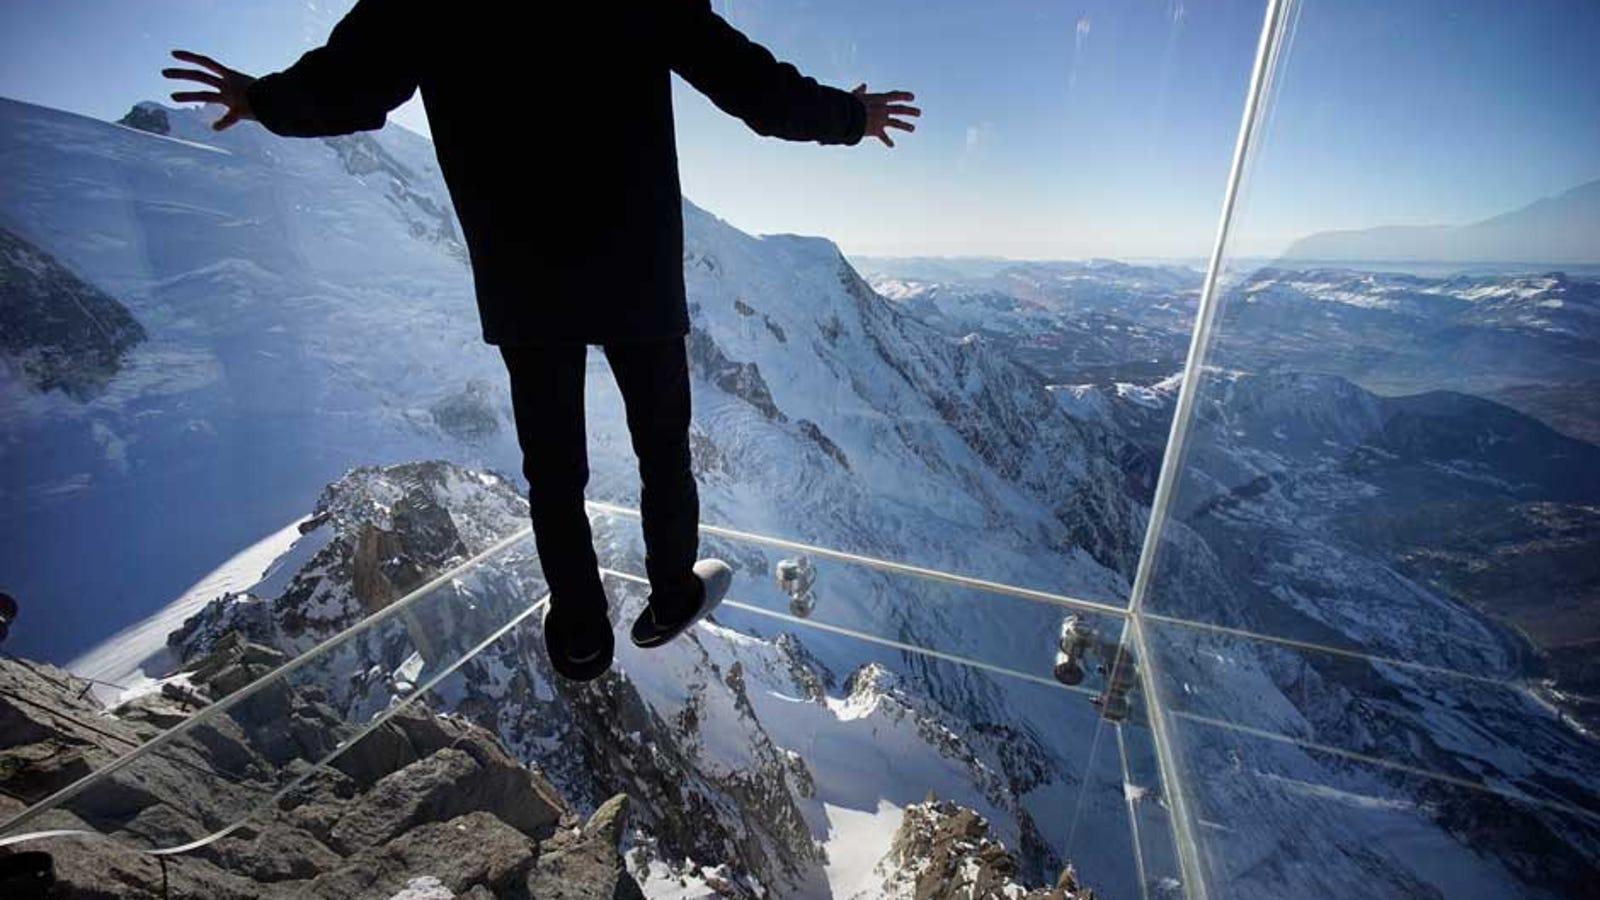 Este mirador de cristal te deja flotar a 3.800 metros sobre los Alpes